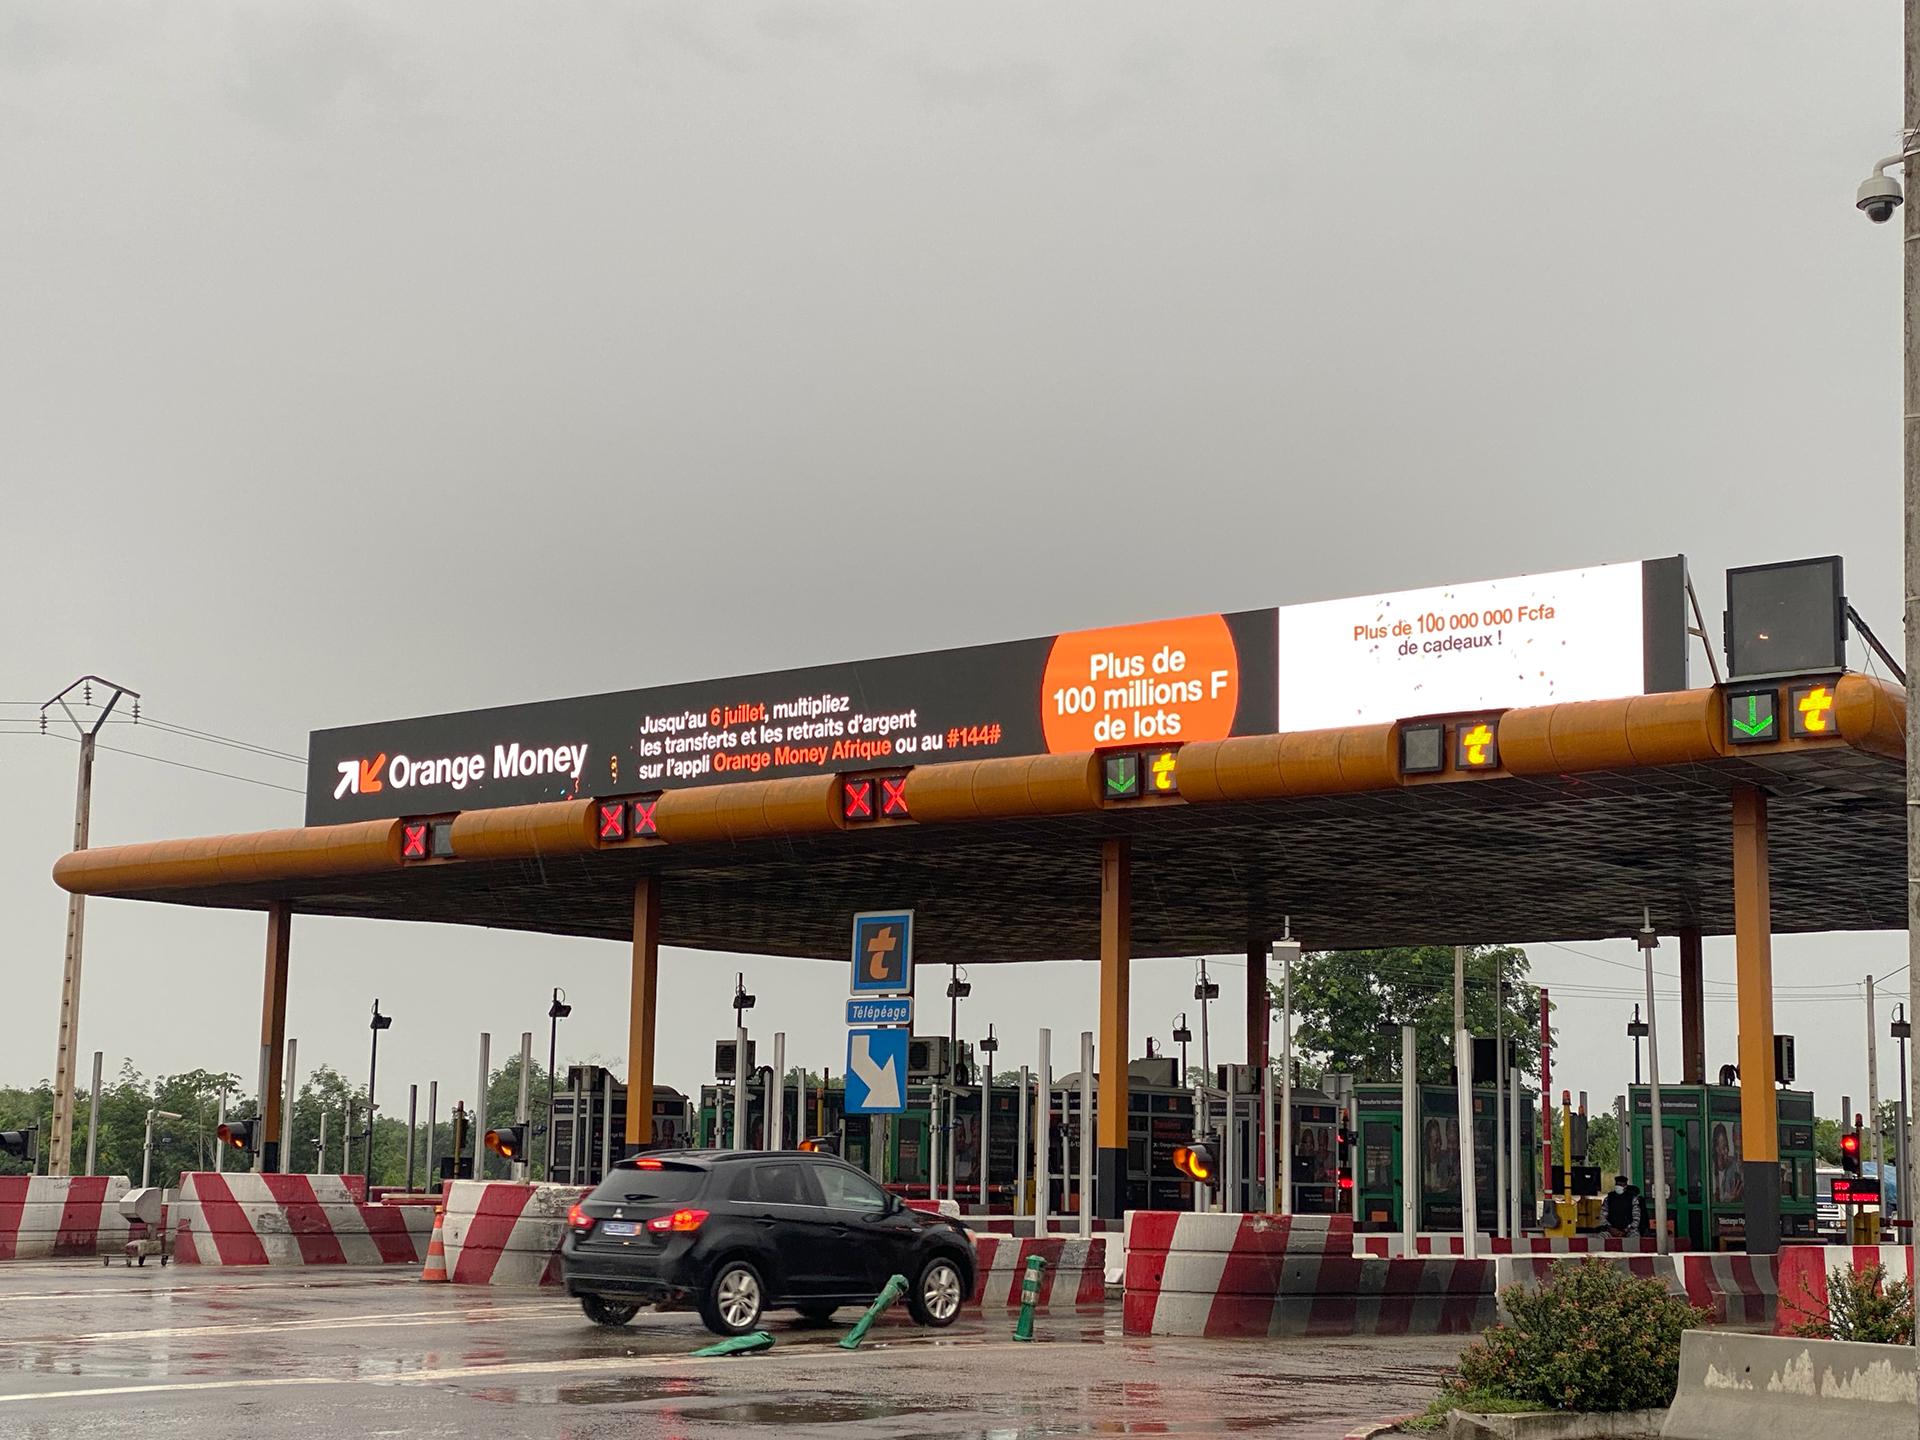 Banner Led Abidjan